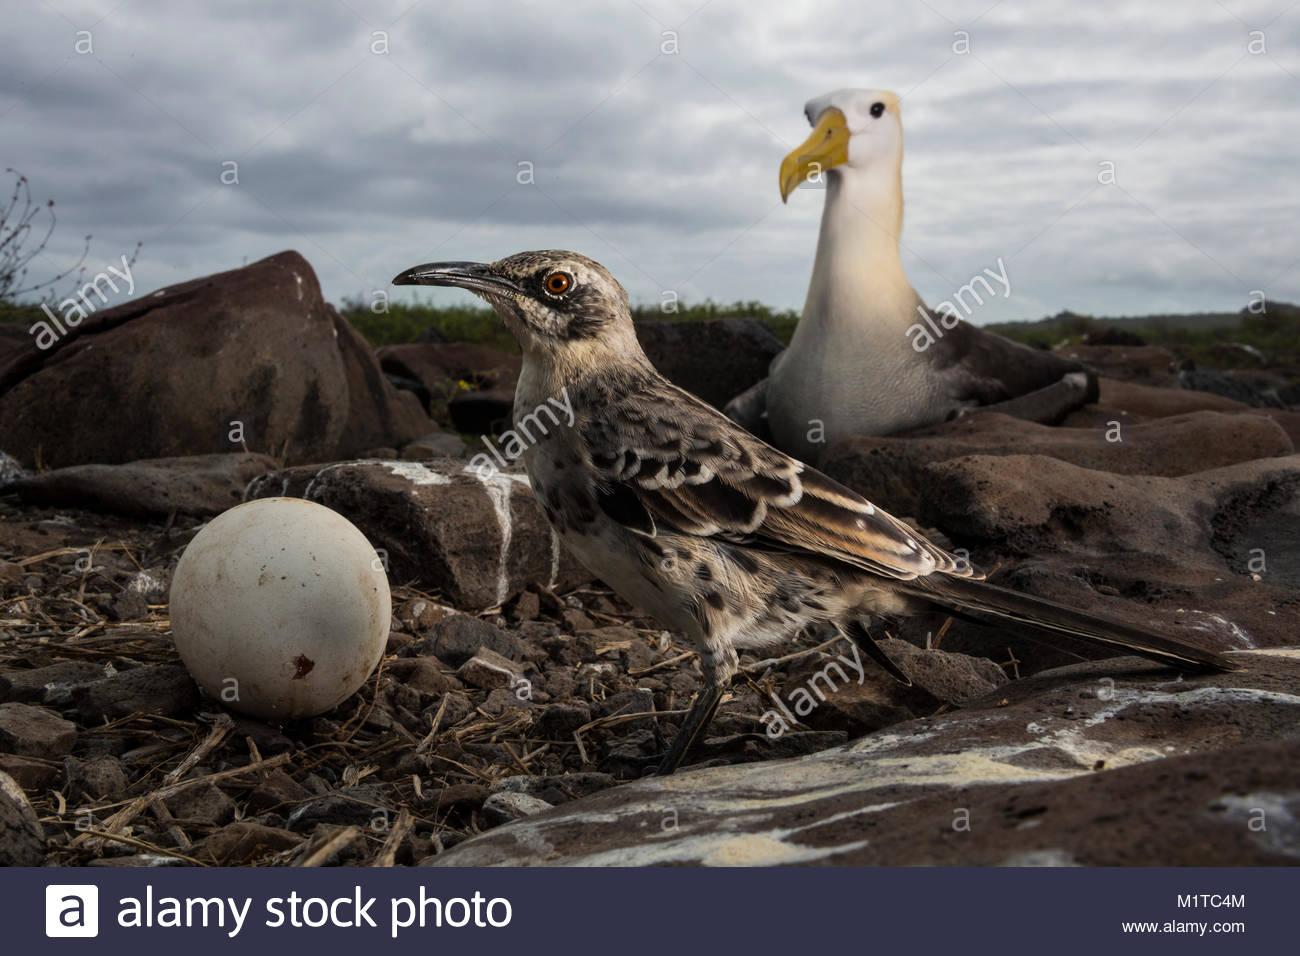 Espanola Island, Galapagos Islands. - Stock Image